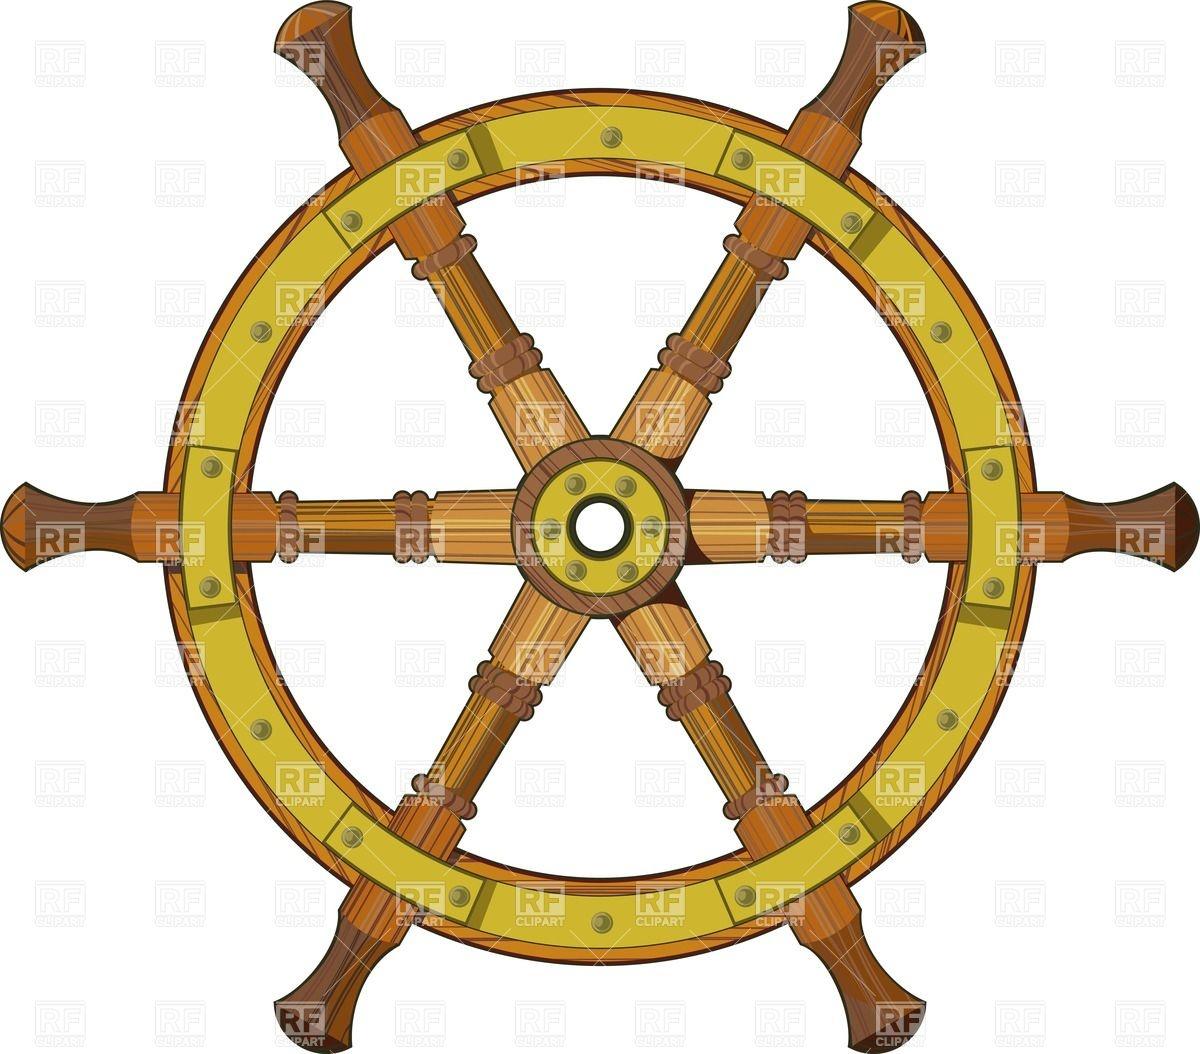 Wooden Ship Steering Wheel Download Roya-Wooden Ship Steering Wheel Download Royalty Free Vector Clipart Eps-10